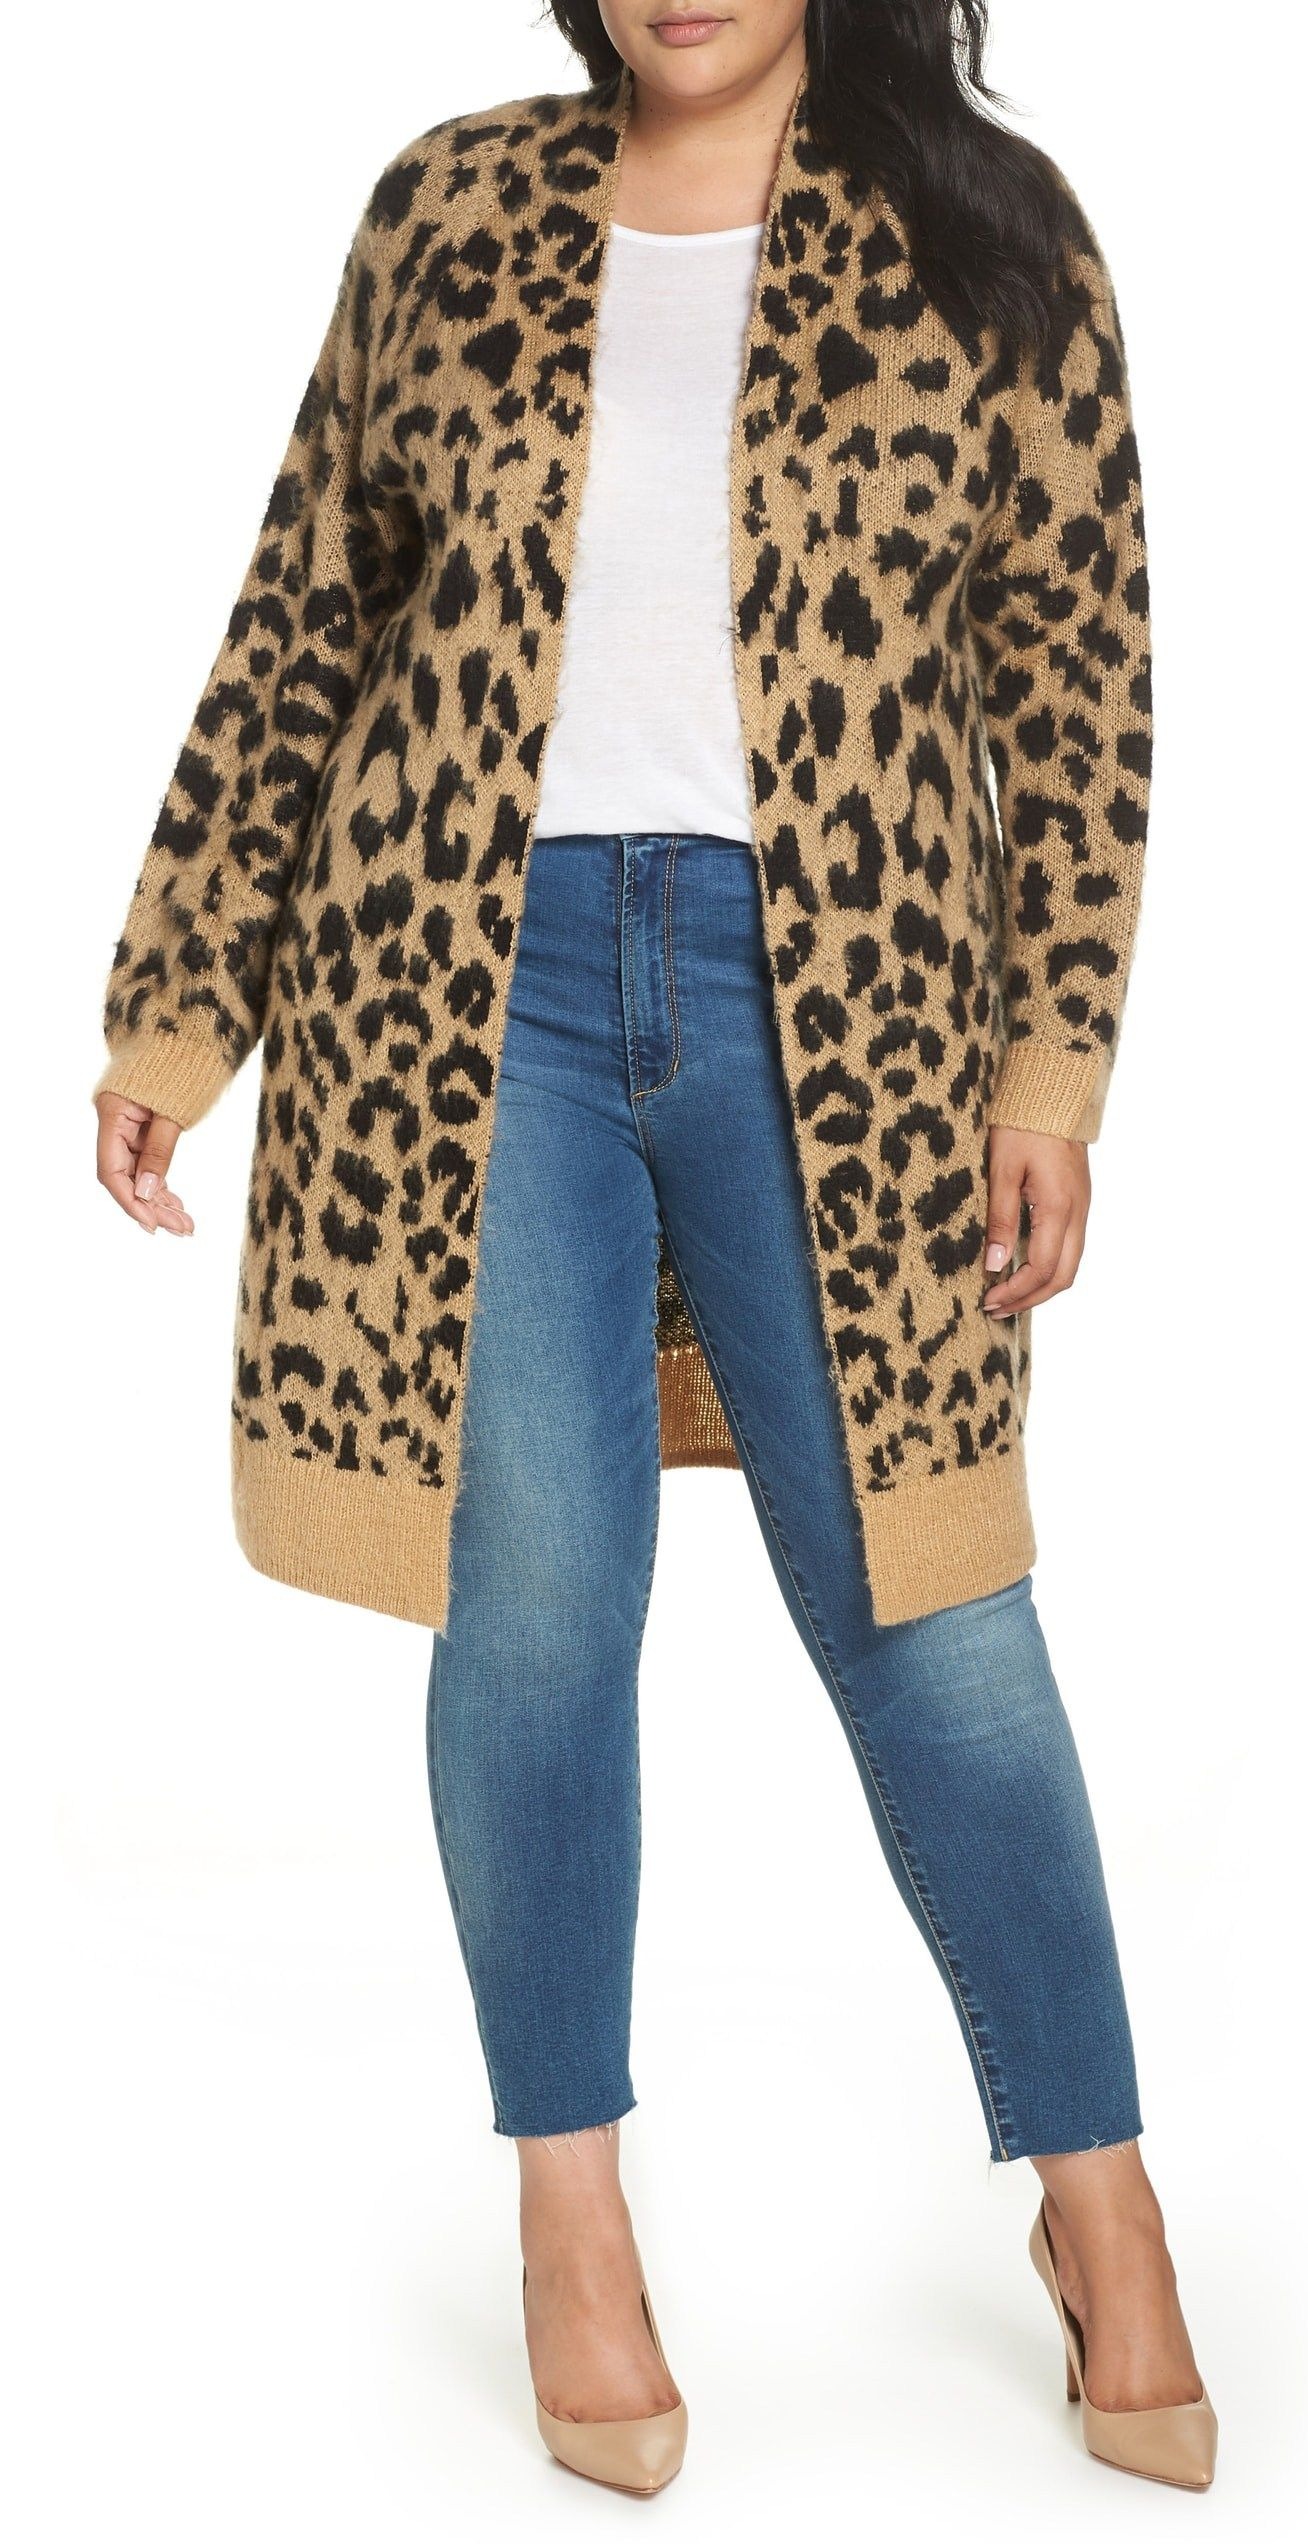 8763541bc3f91 Plus Size Leopard Cardigan Outfit Ideas - Plus Size Fall Outfits - Plus  Size Fashion for Women - alexawebb.com  alexawebb  plussize